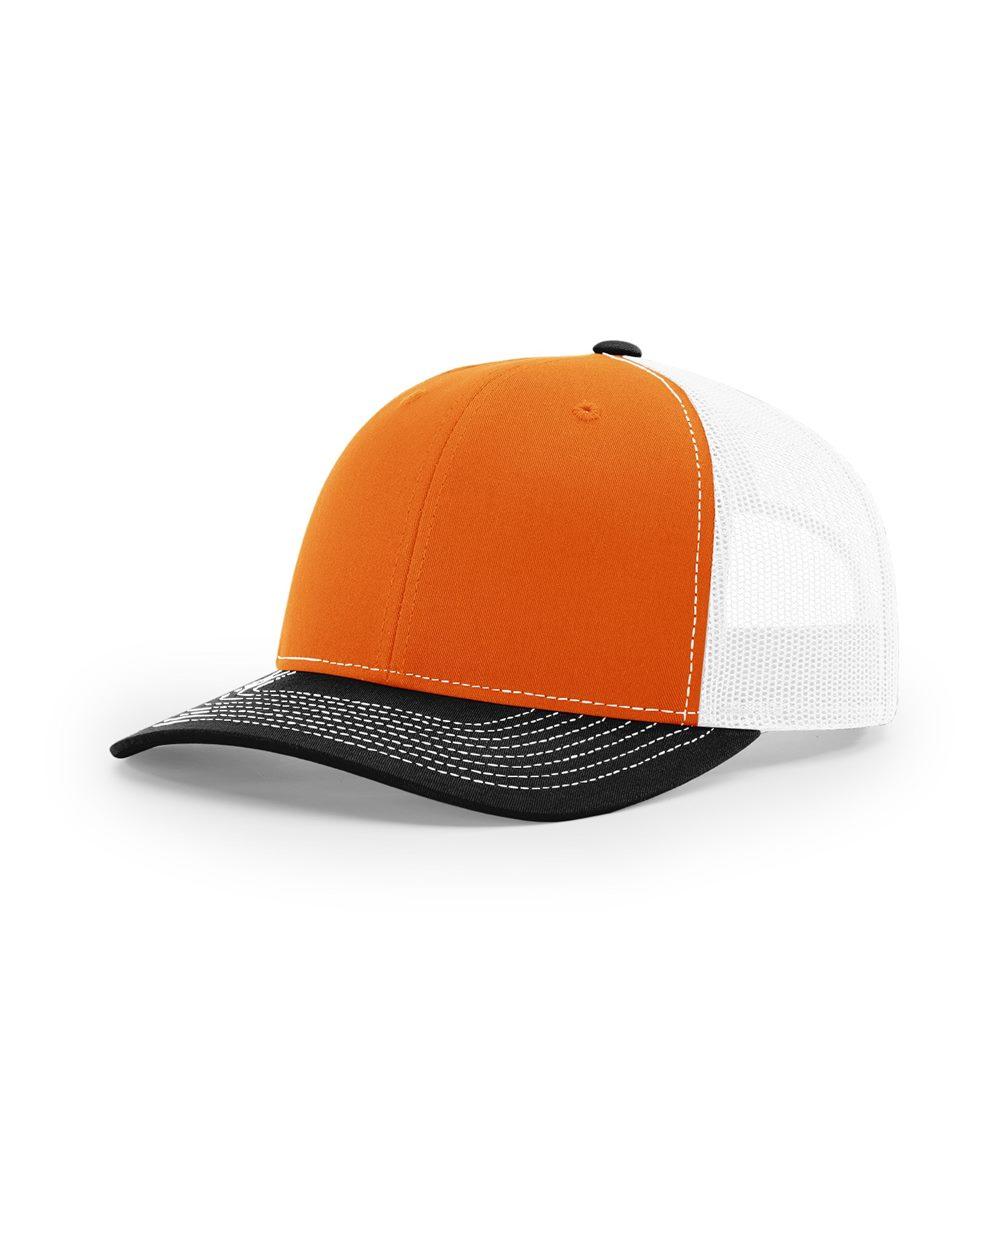 Orange/ Black/ White